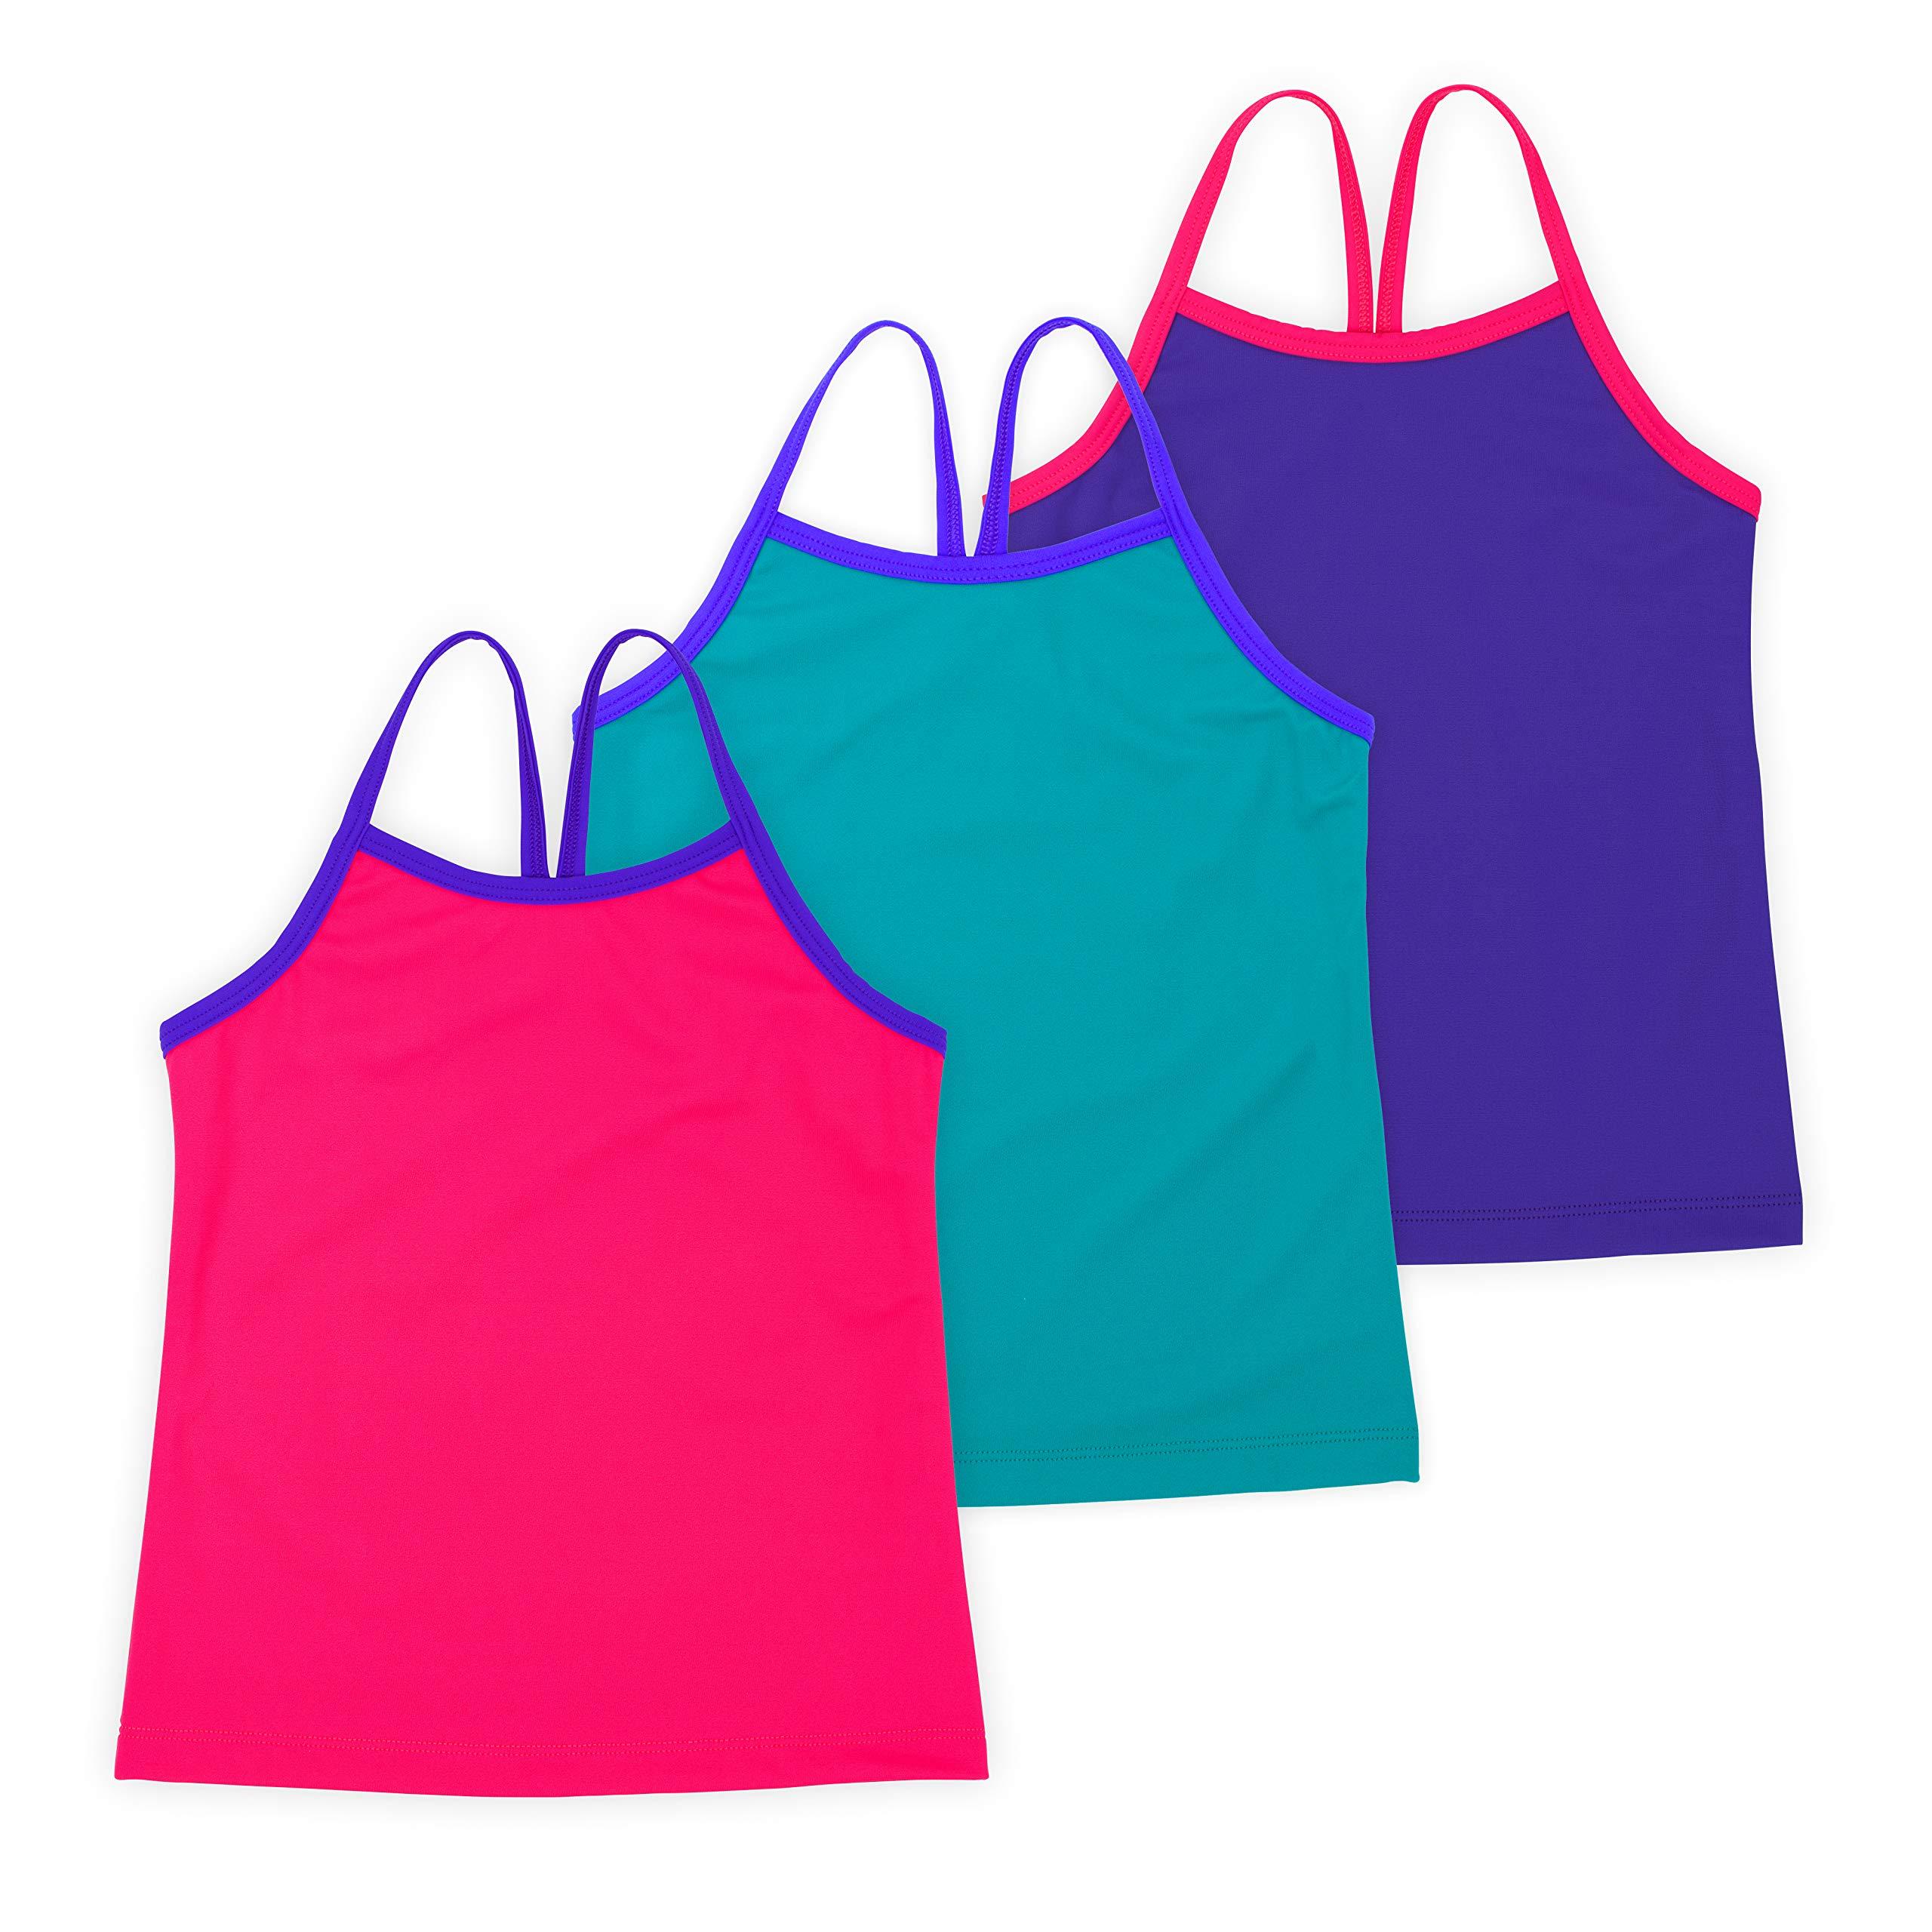 Lucky & Me Ella Girls Dance Tank Top, Gymnastics & Dancewear, 3-Pack, Rosey Posey 2/3